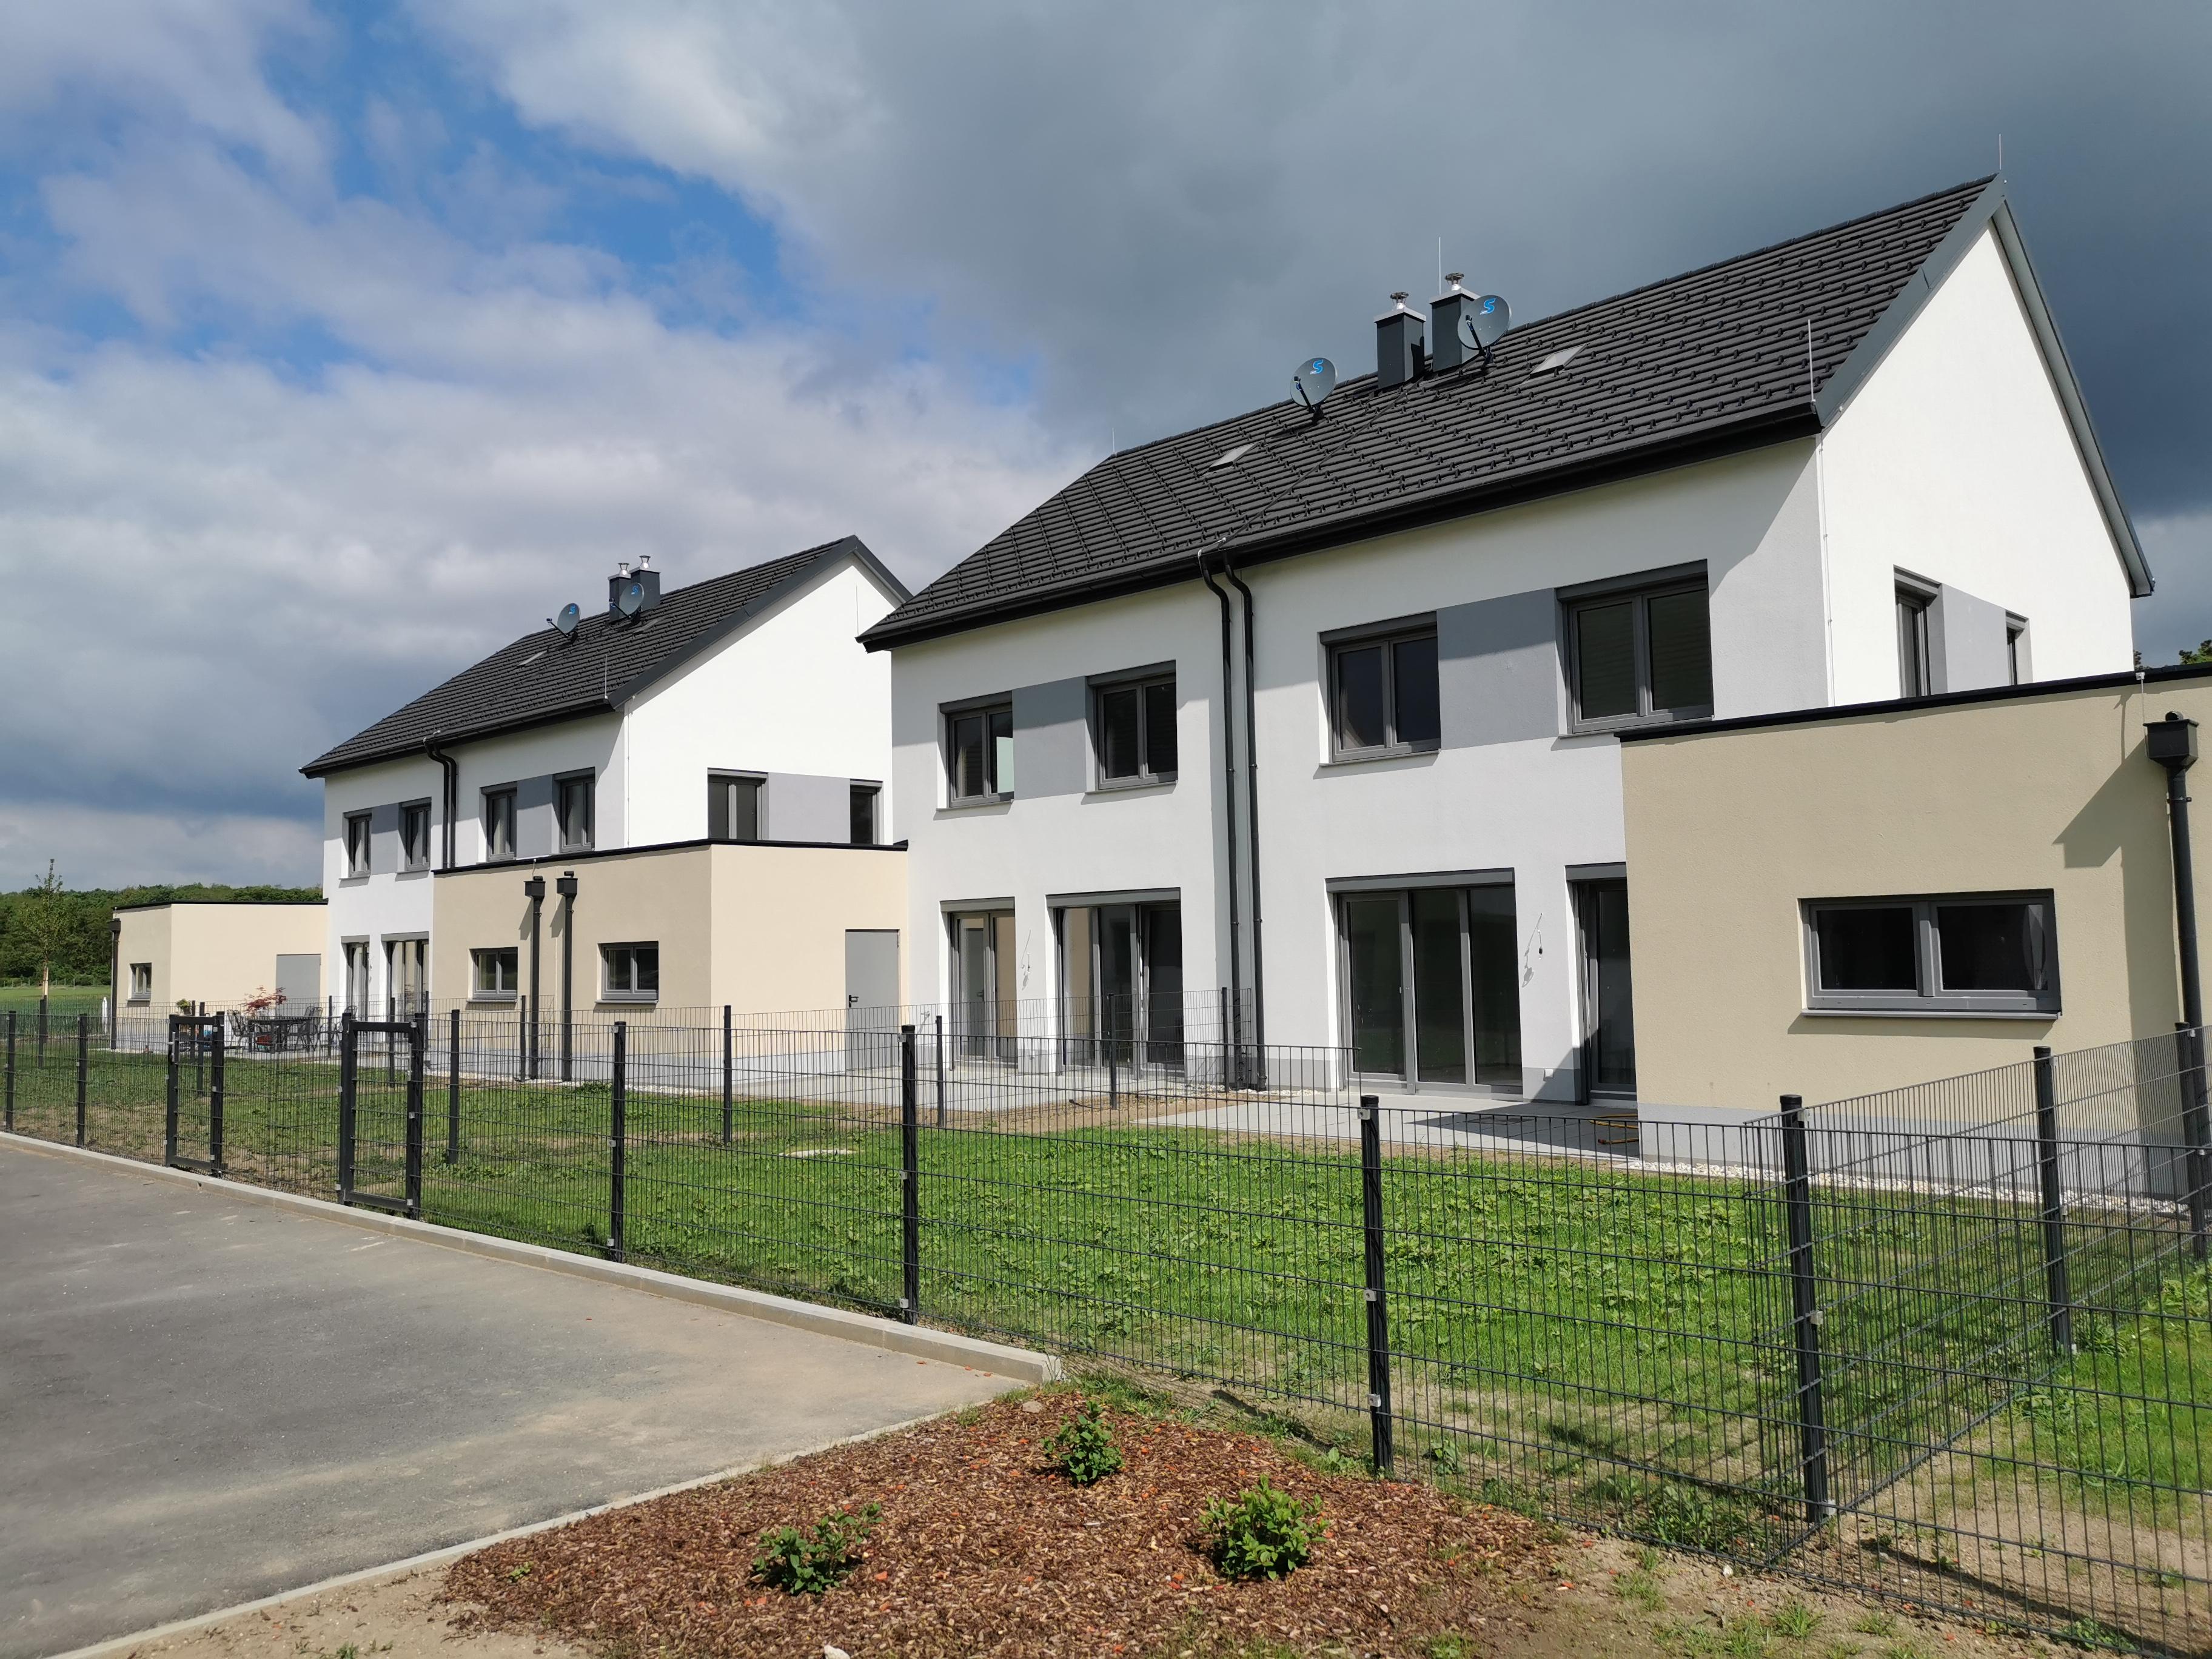 Immobilie von Kamptal in 2136 Laa an der Thaya, Mistelbach, Laa/Thaya XVIII - Top 7 #3